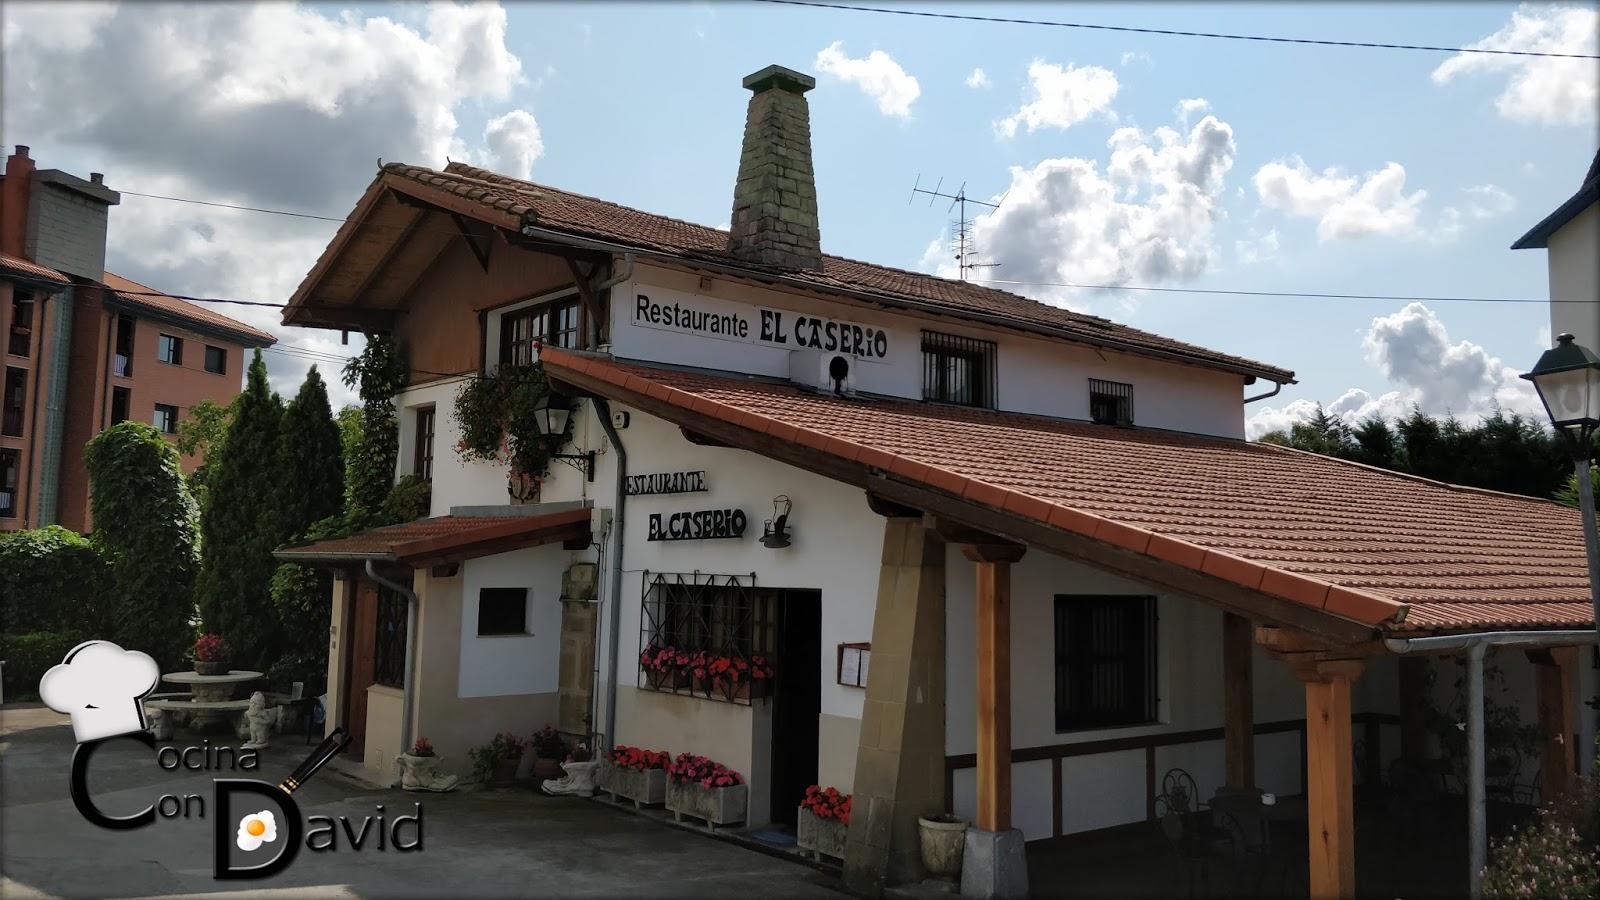 Cocinacondavid - Restaurante izarza sondika ...